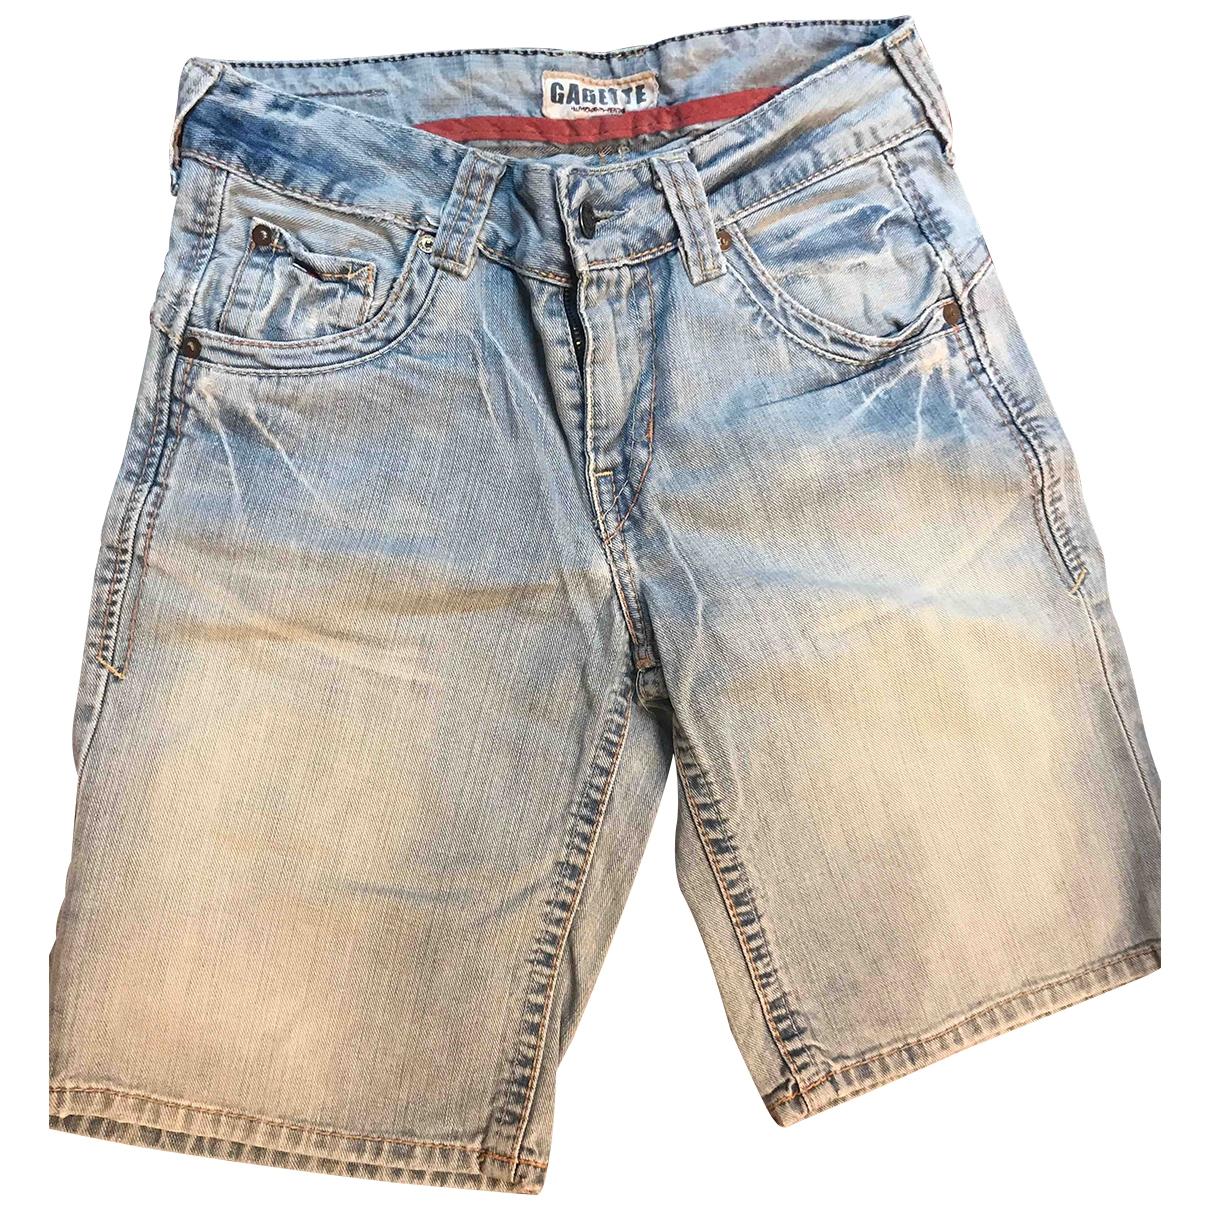 Tommy Hilfiger \N Blue Denim - Jeans Shorts for Women 36 IT